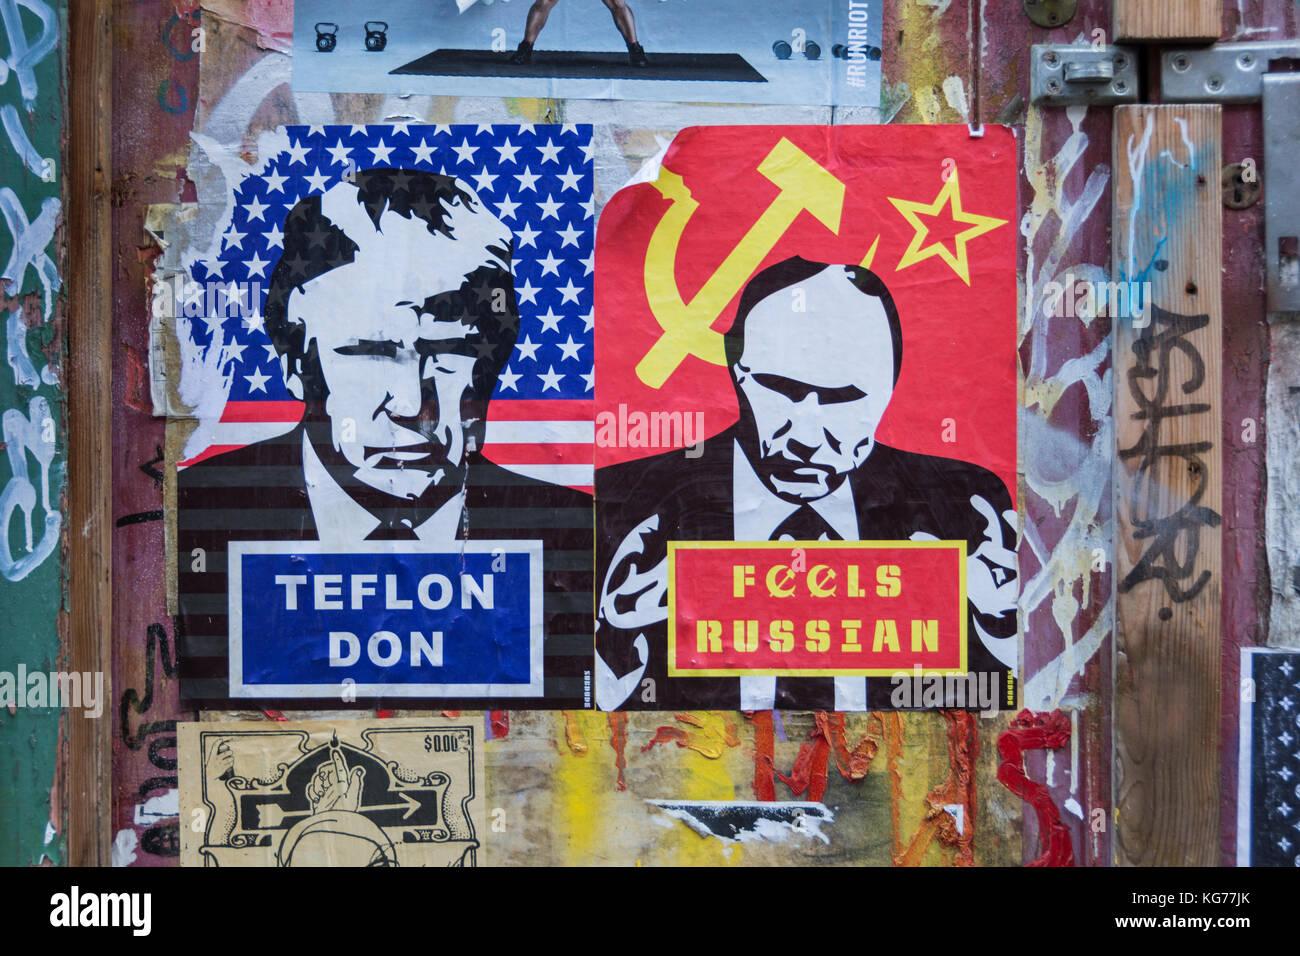 Bast's Teflon Don and Fools Russian street art below door of H. Suskin LTD. General Textile & Trimming Merchants, - Stock Image